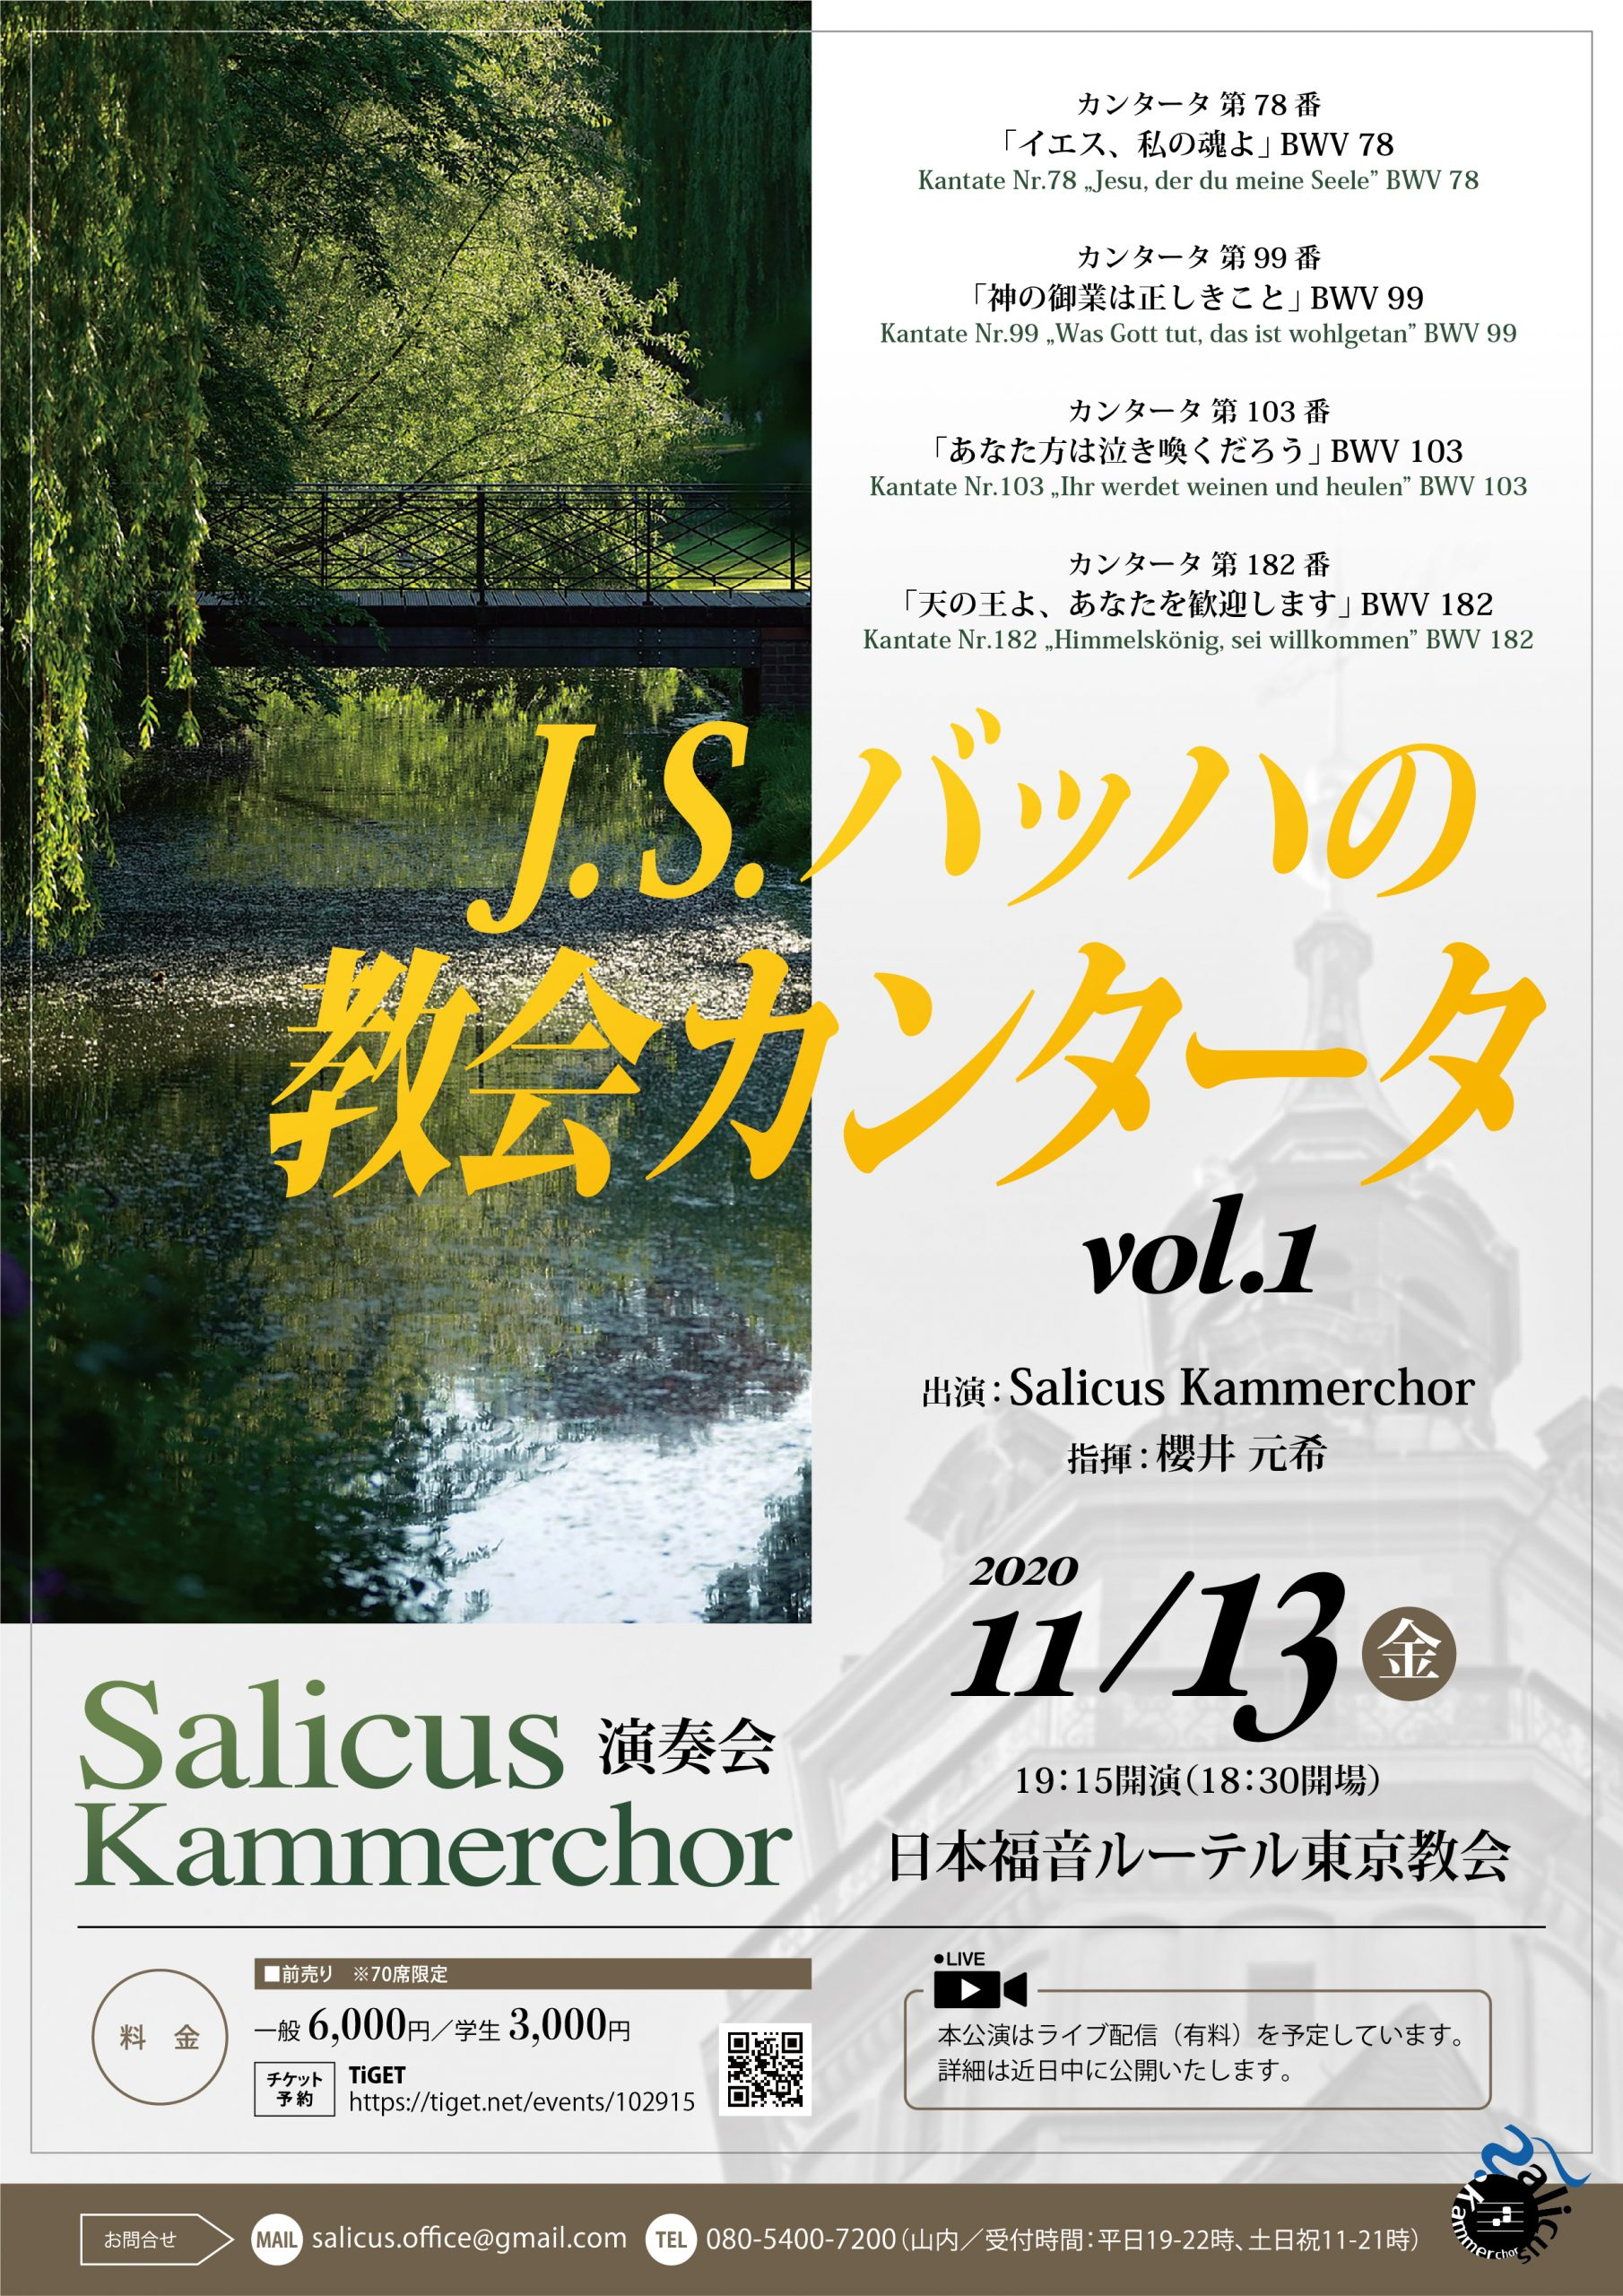 Salicus Kammerchor 〜J.S.バッハの協会カンタータvol.1〜